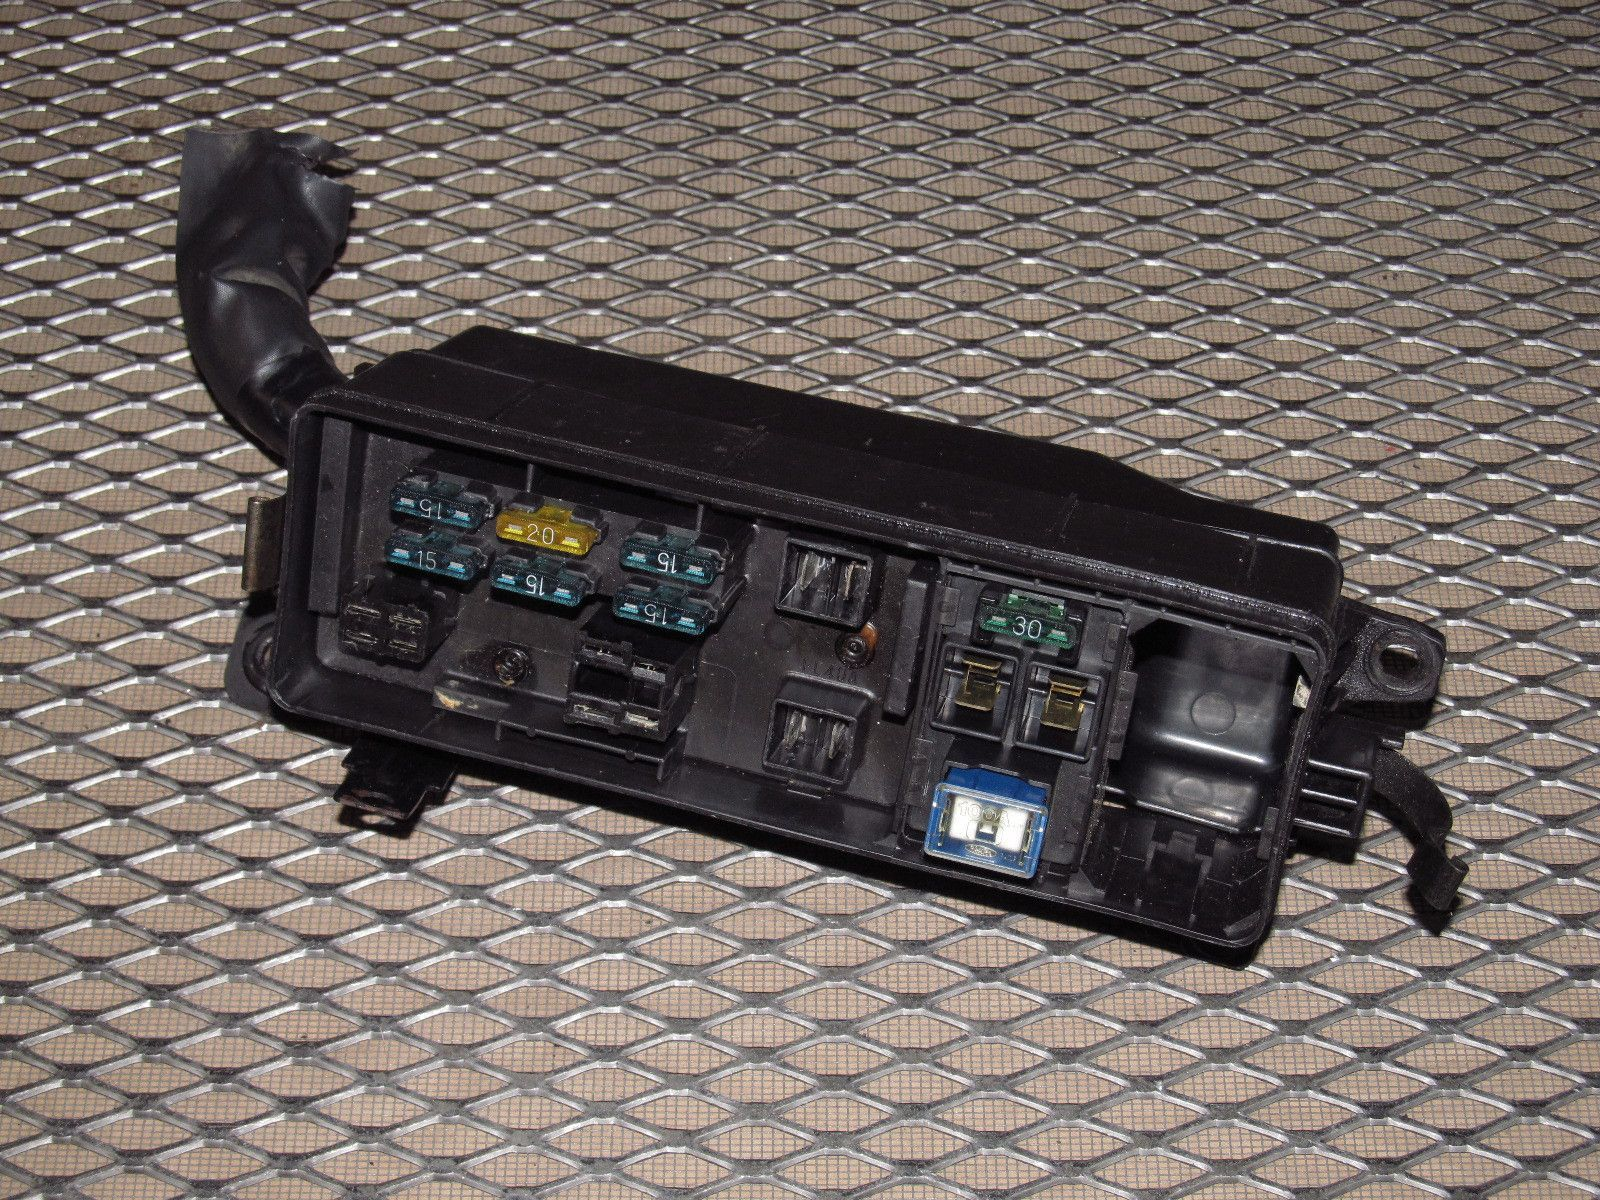 89 90 91 92 toyota supra oem engine fuse box turbo products toyota celica fuse box [ 1600 x 1200 Pixel ]